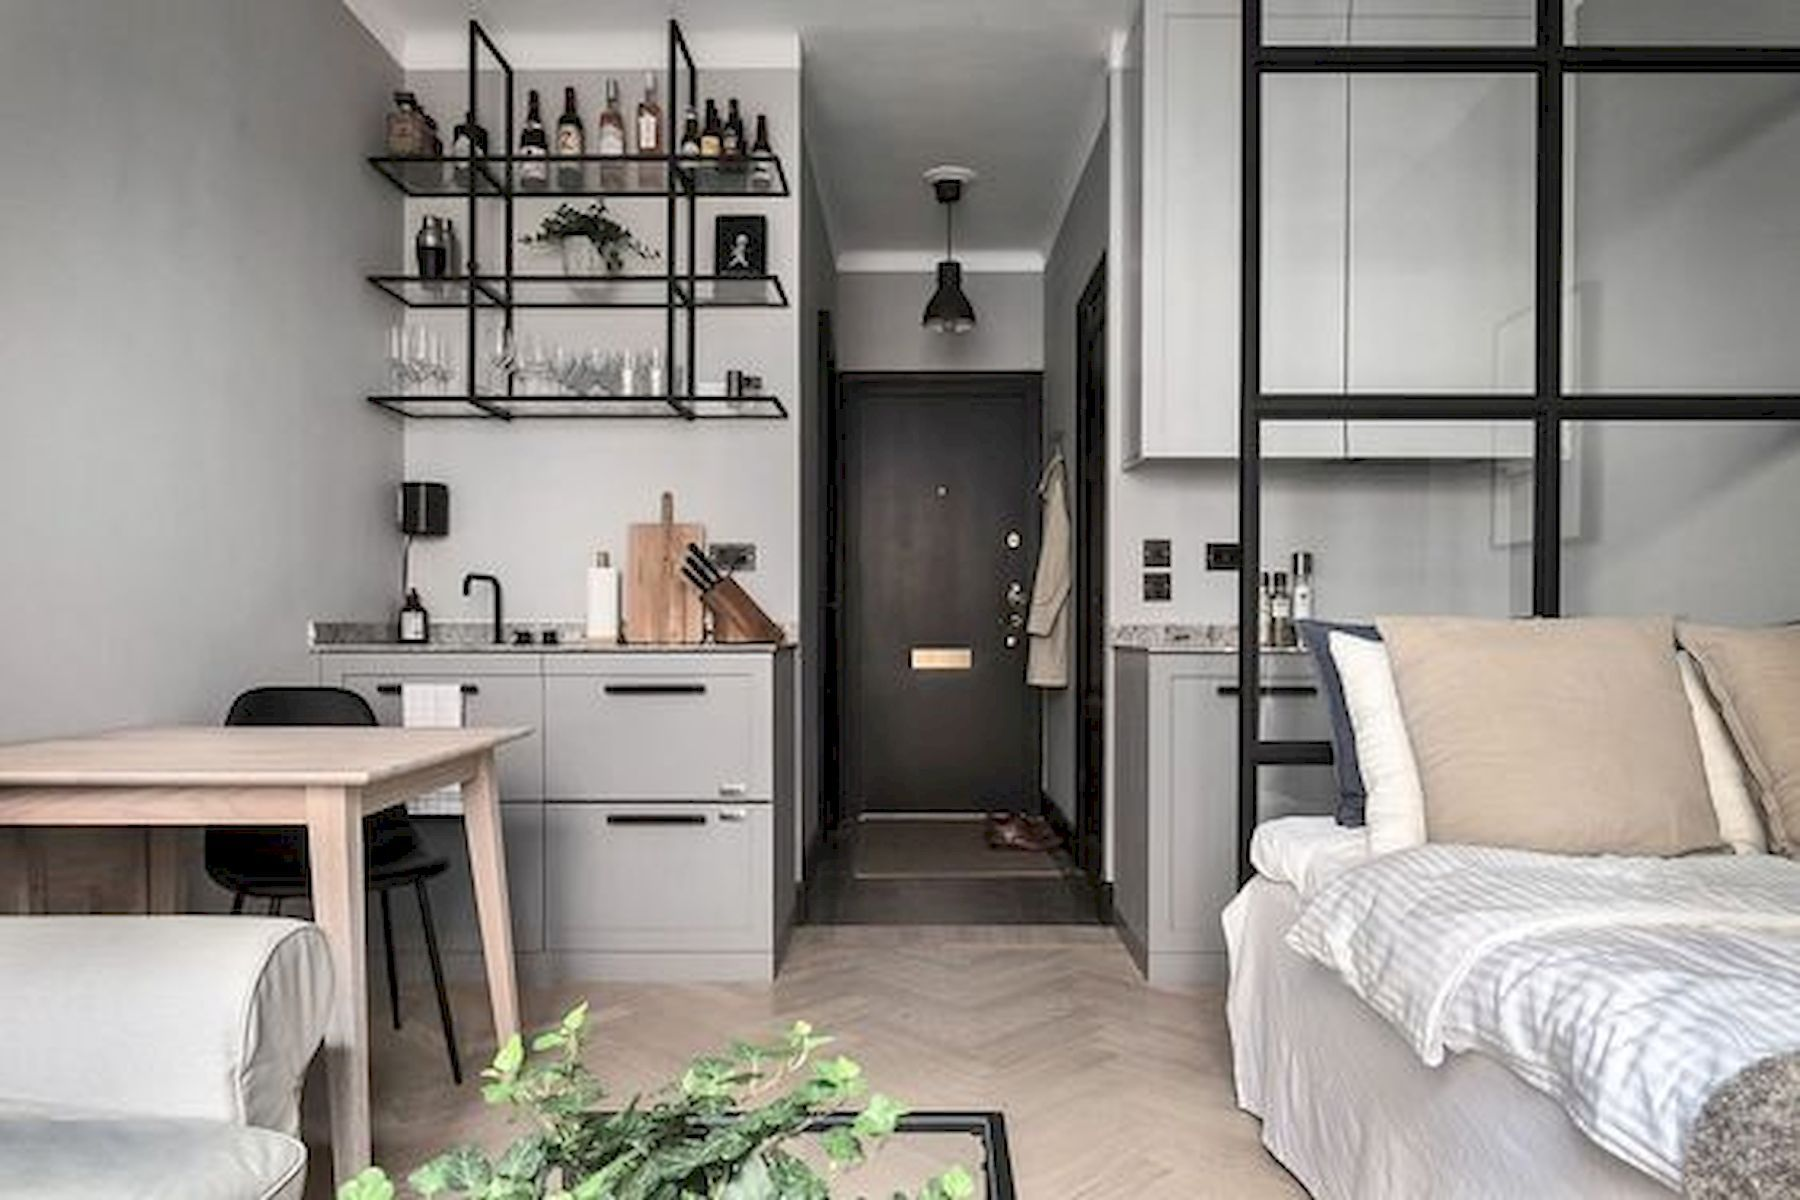 Adorable 50 Stunning Minimalist Studio Apartment Small Spaces Decor Idea Small Apartment Interior Small Studio Apartment Decorating Minimalist Apartment Decor